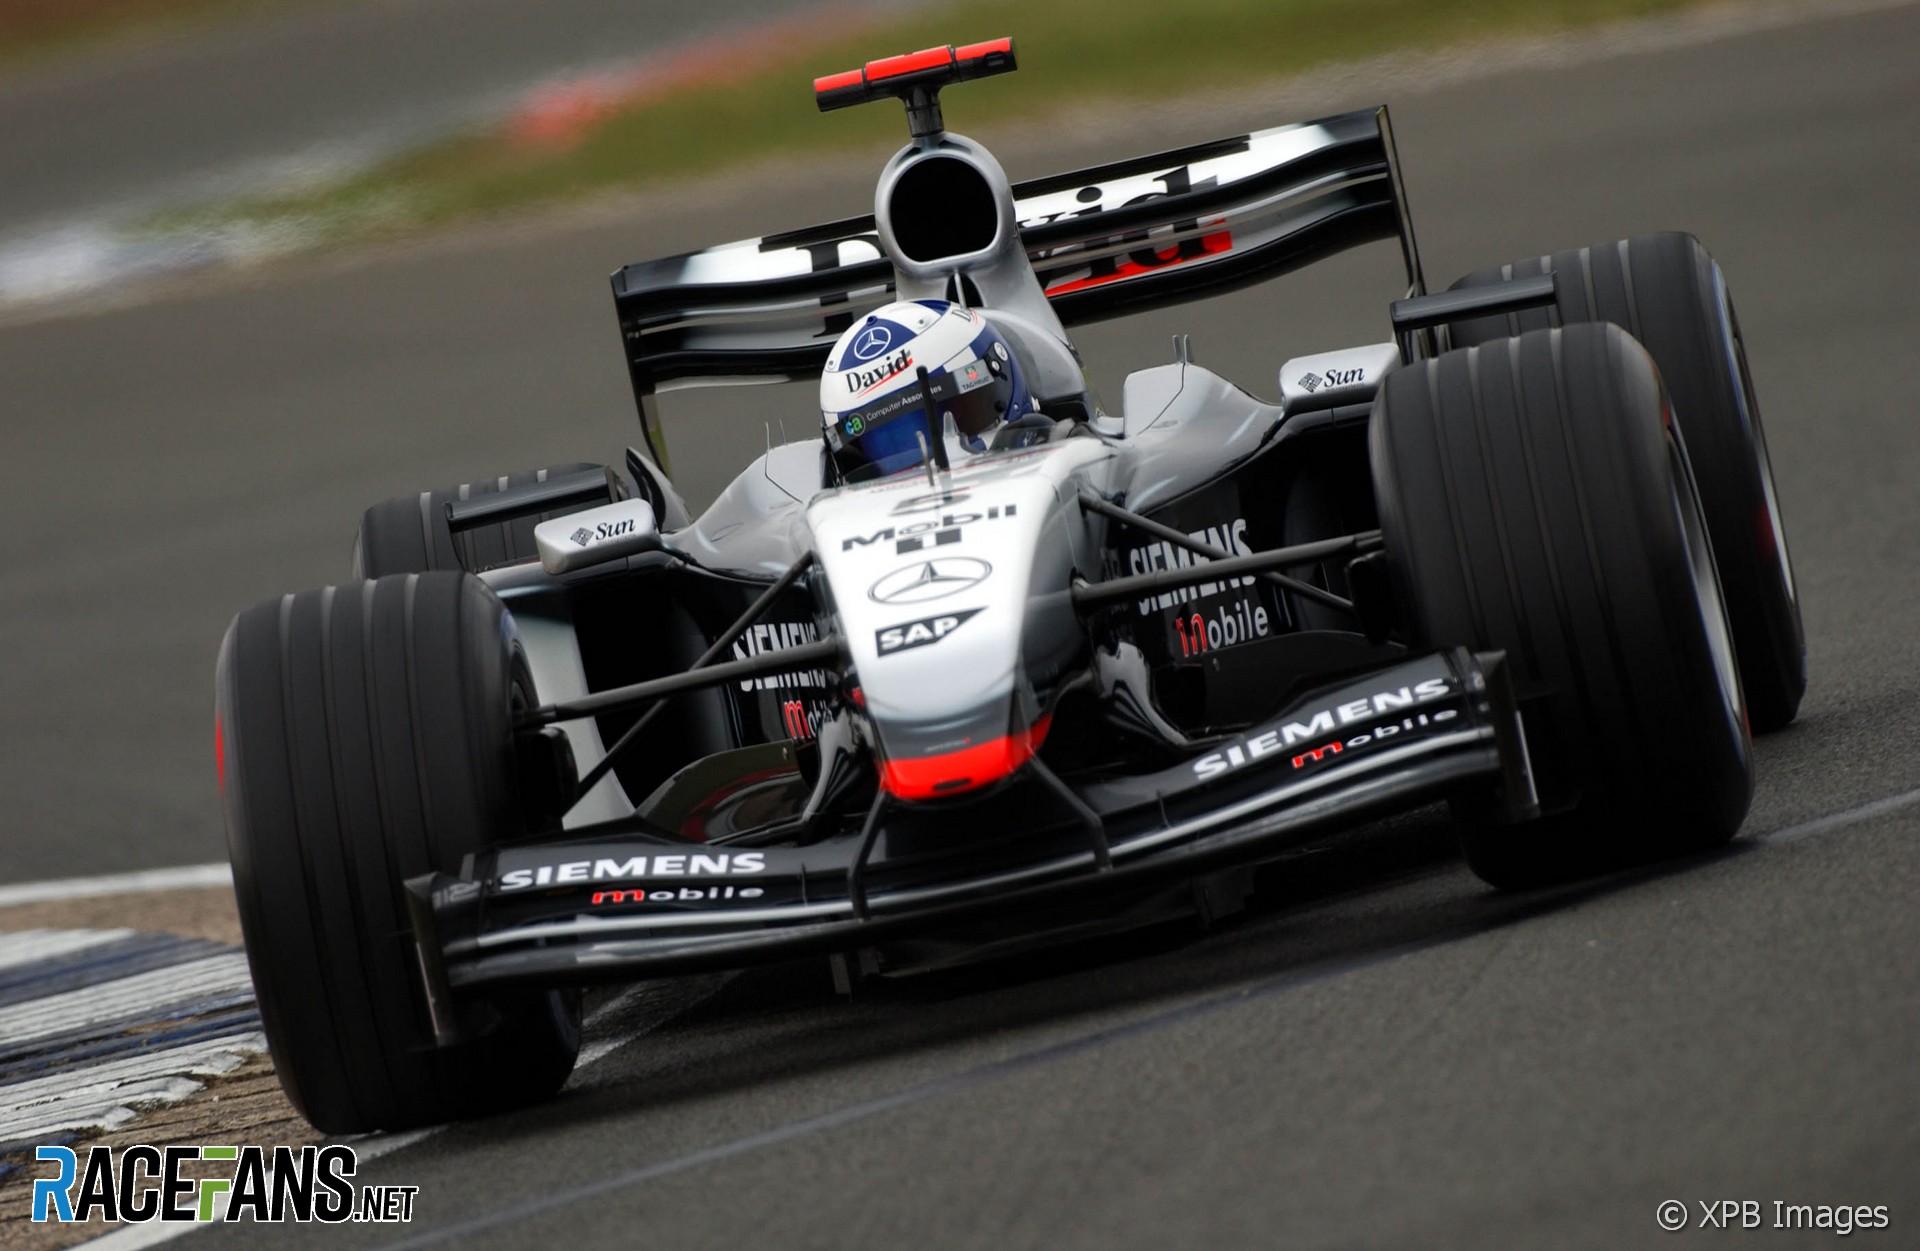 David Coulthard, McLaren, Silverstone, 2003